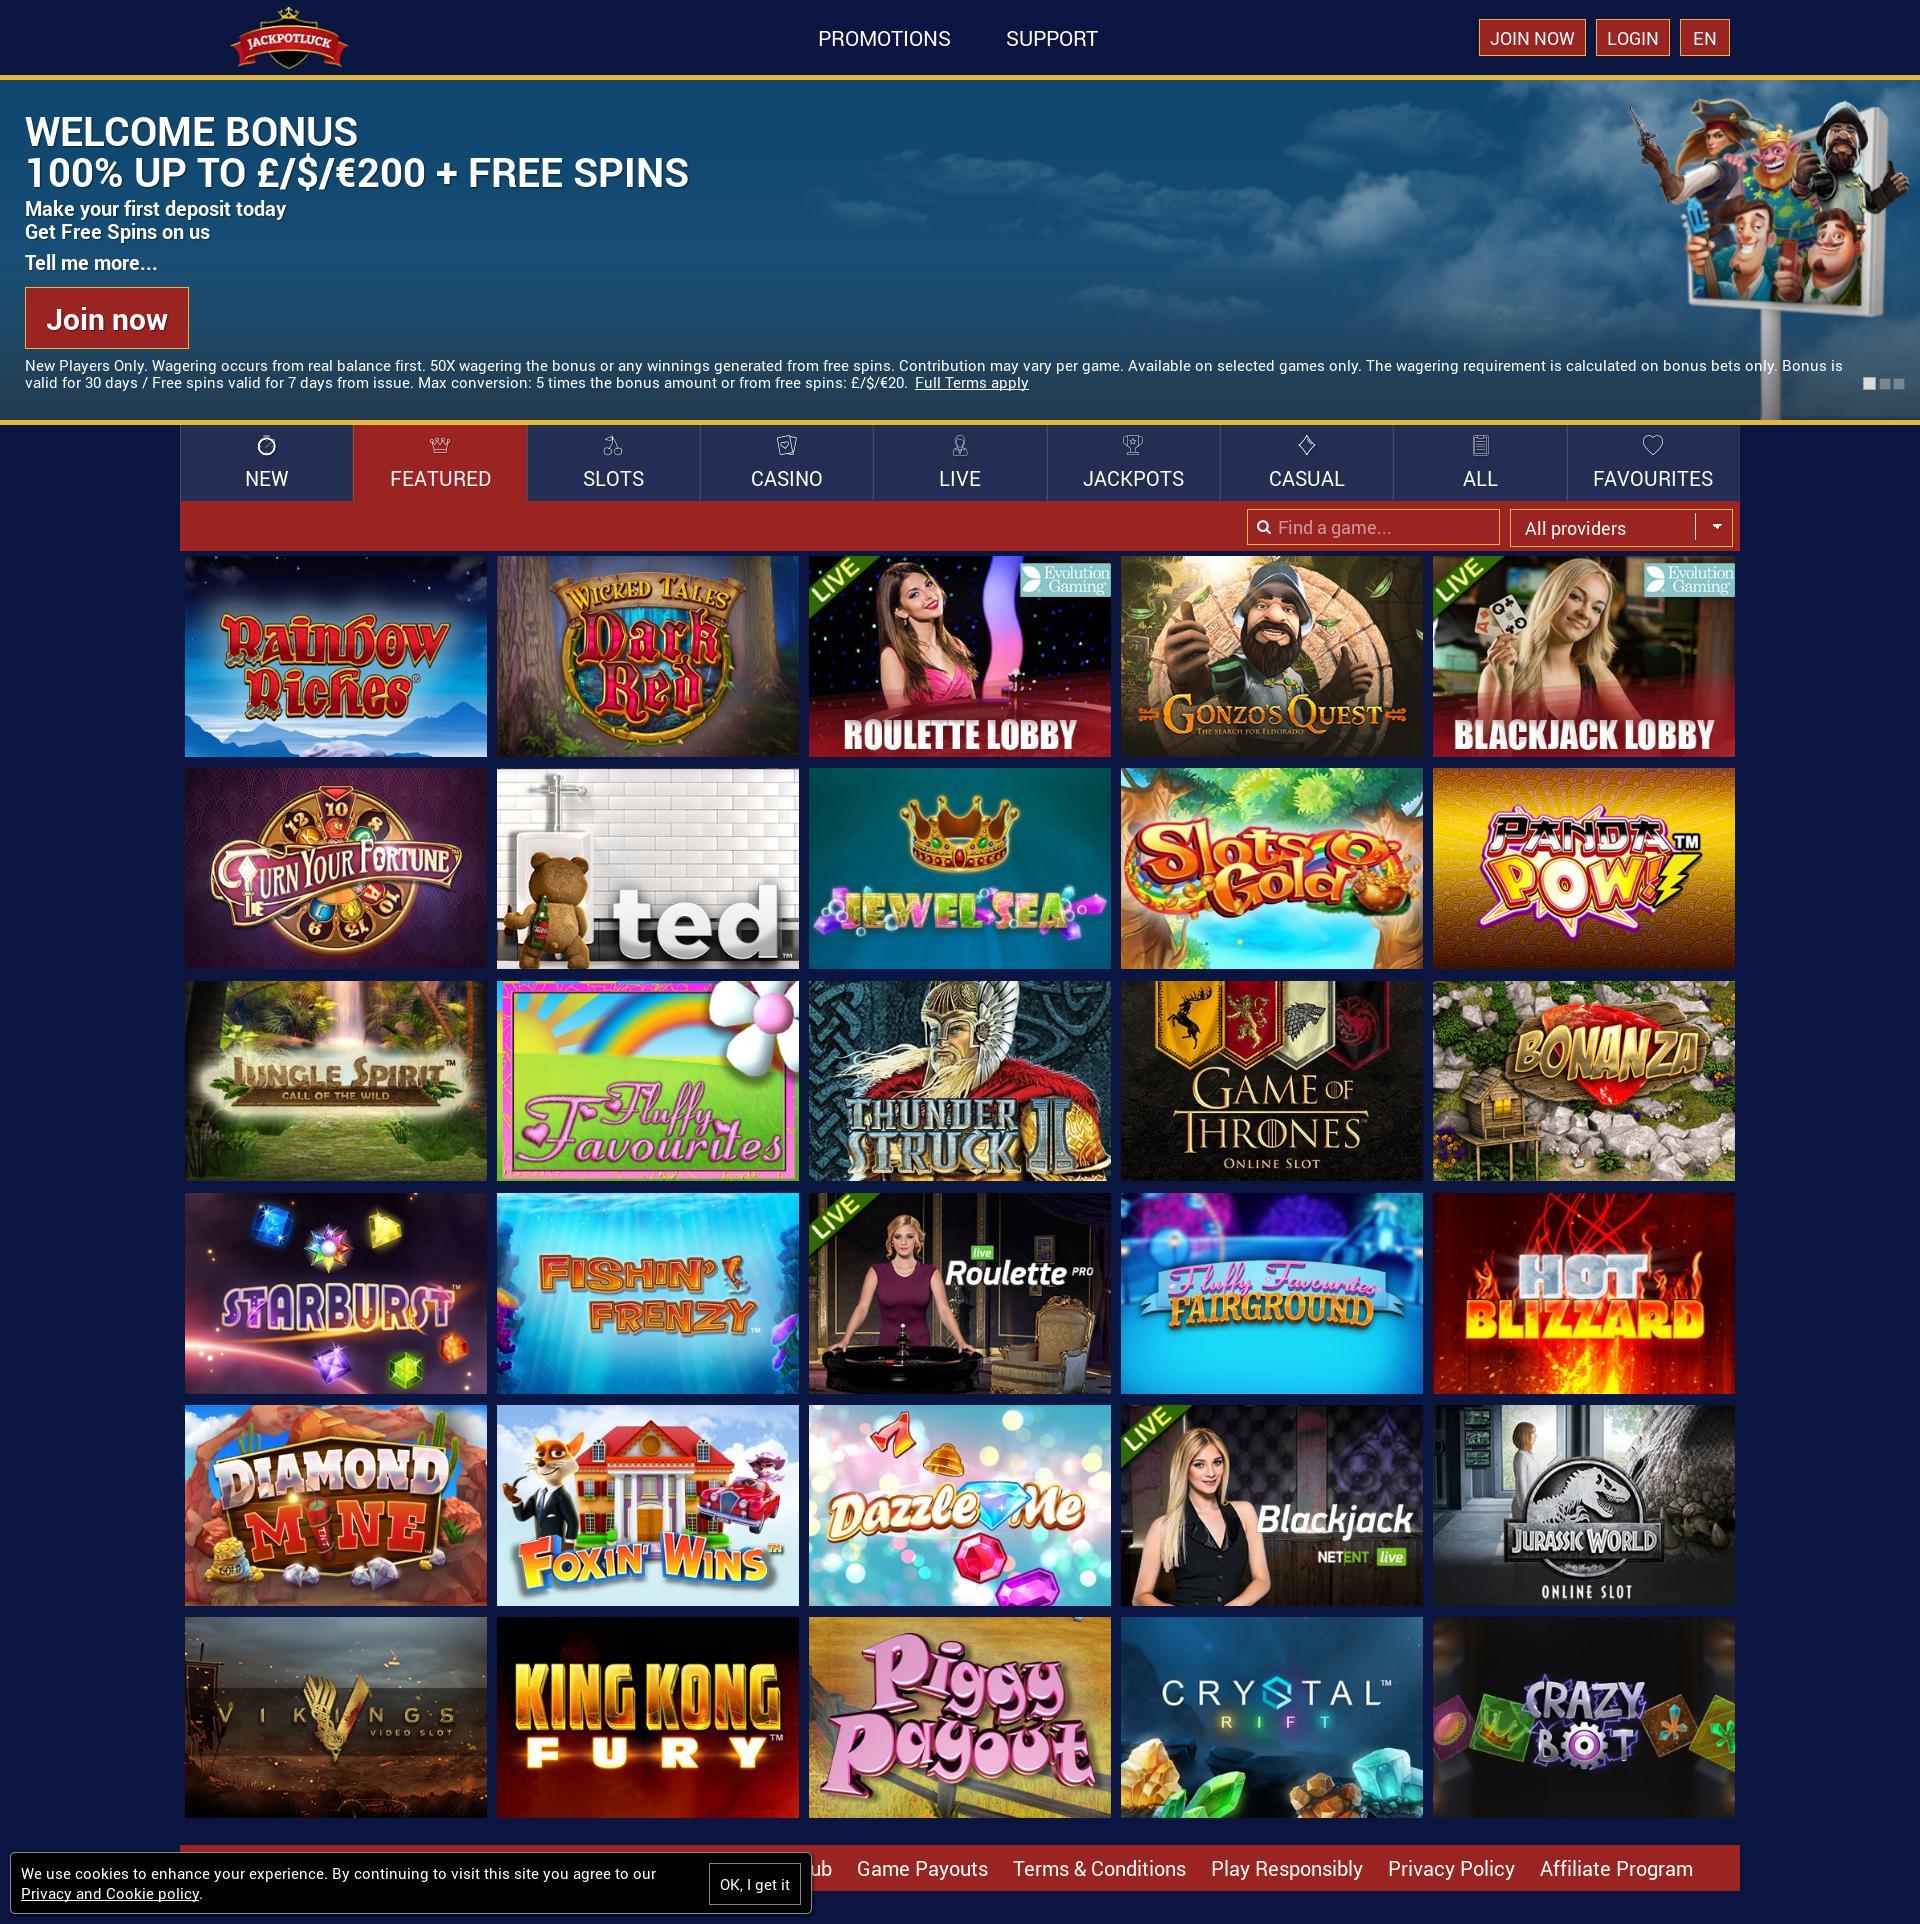 Casino screen Lobby 2019-02-18 for United Kingdom